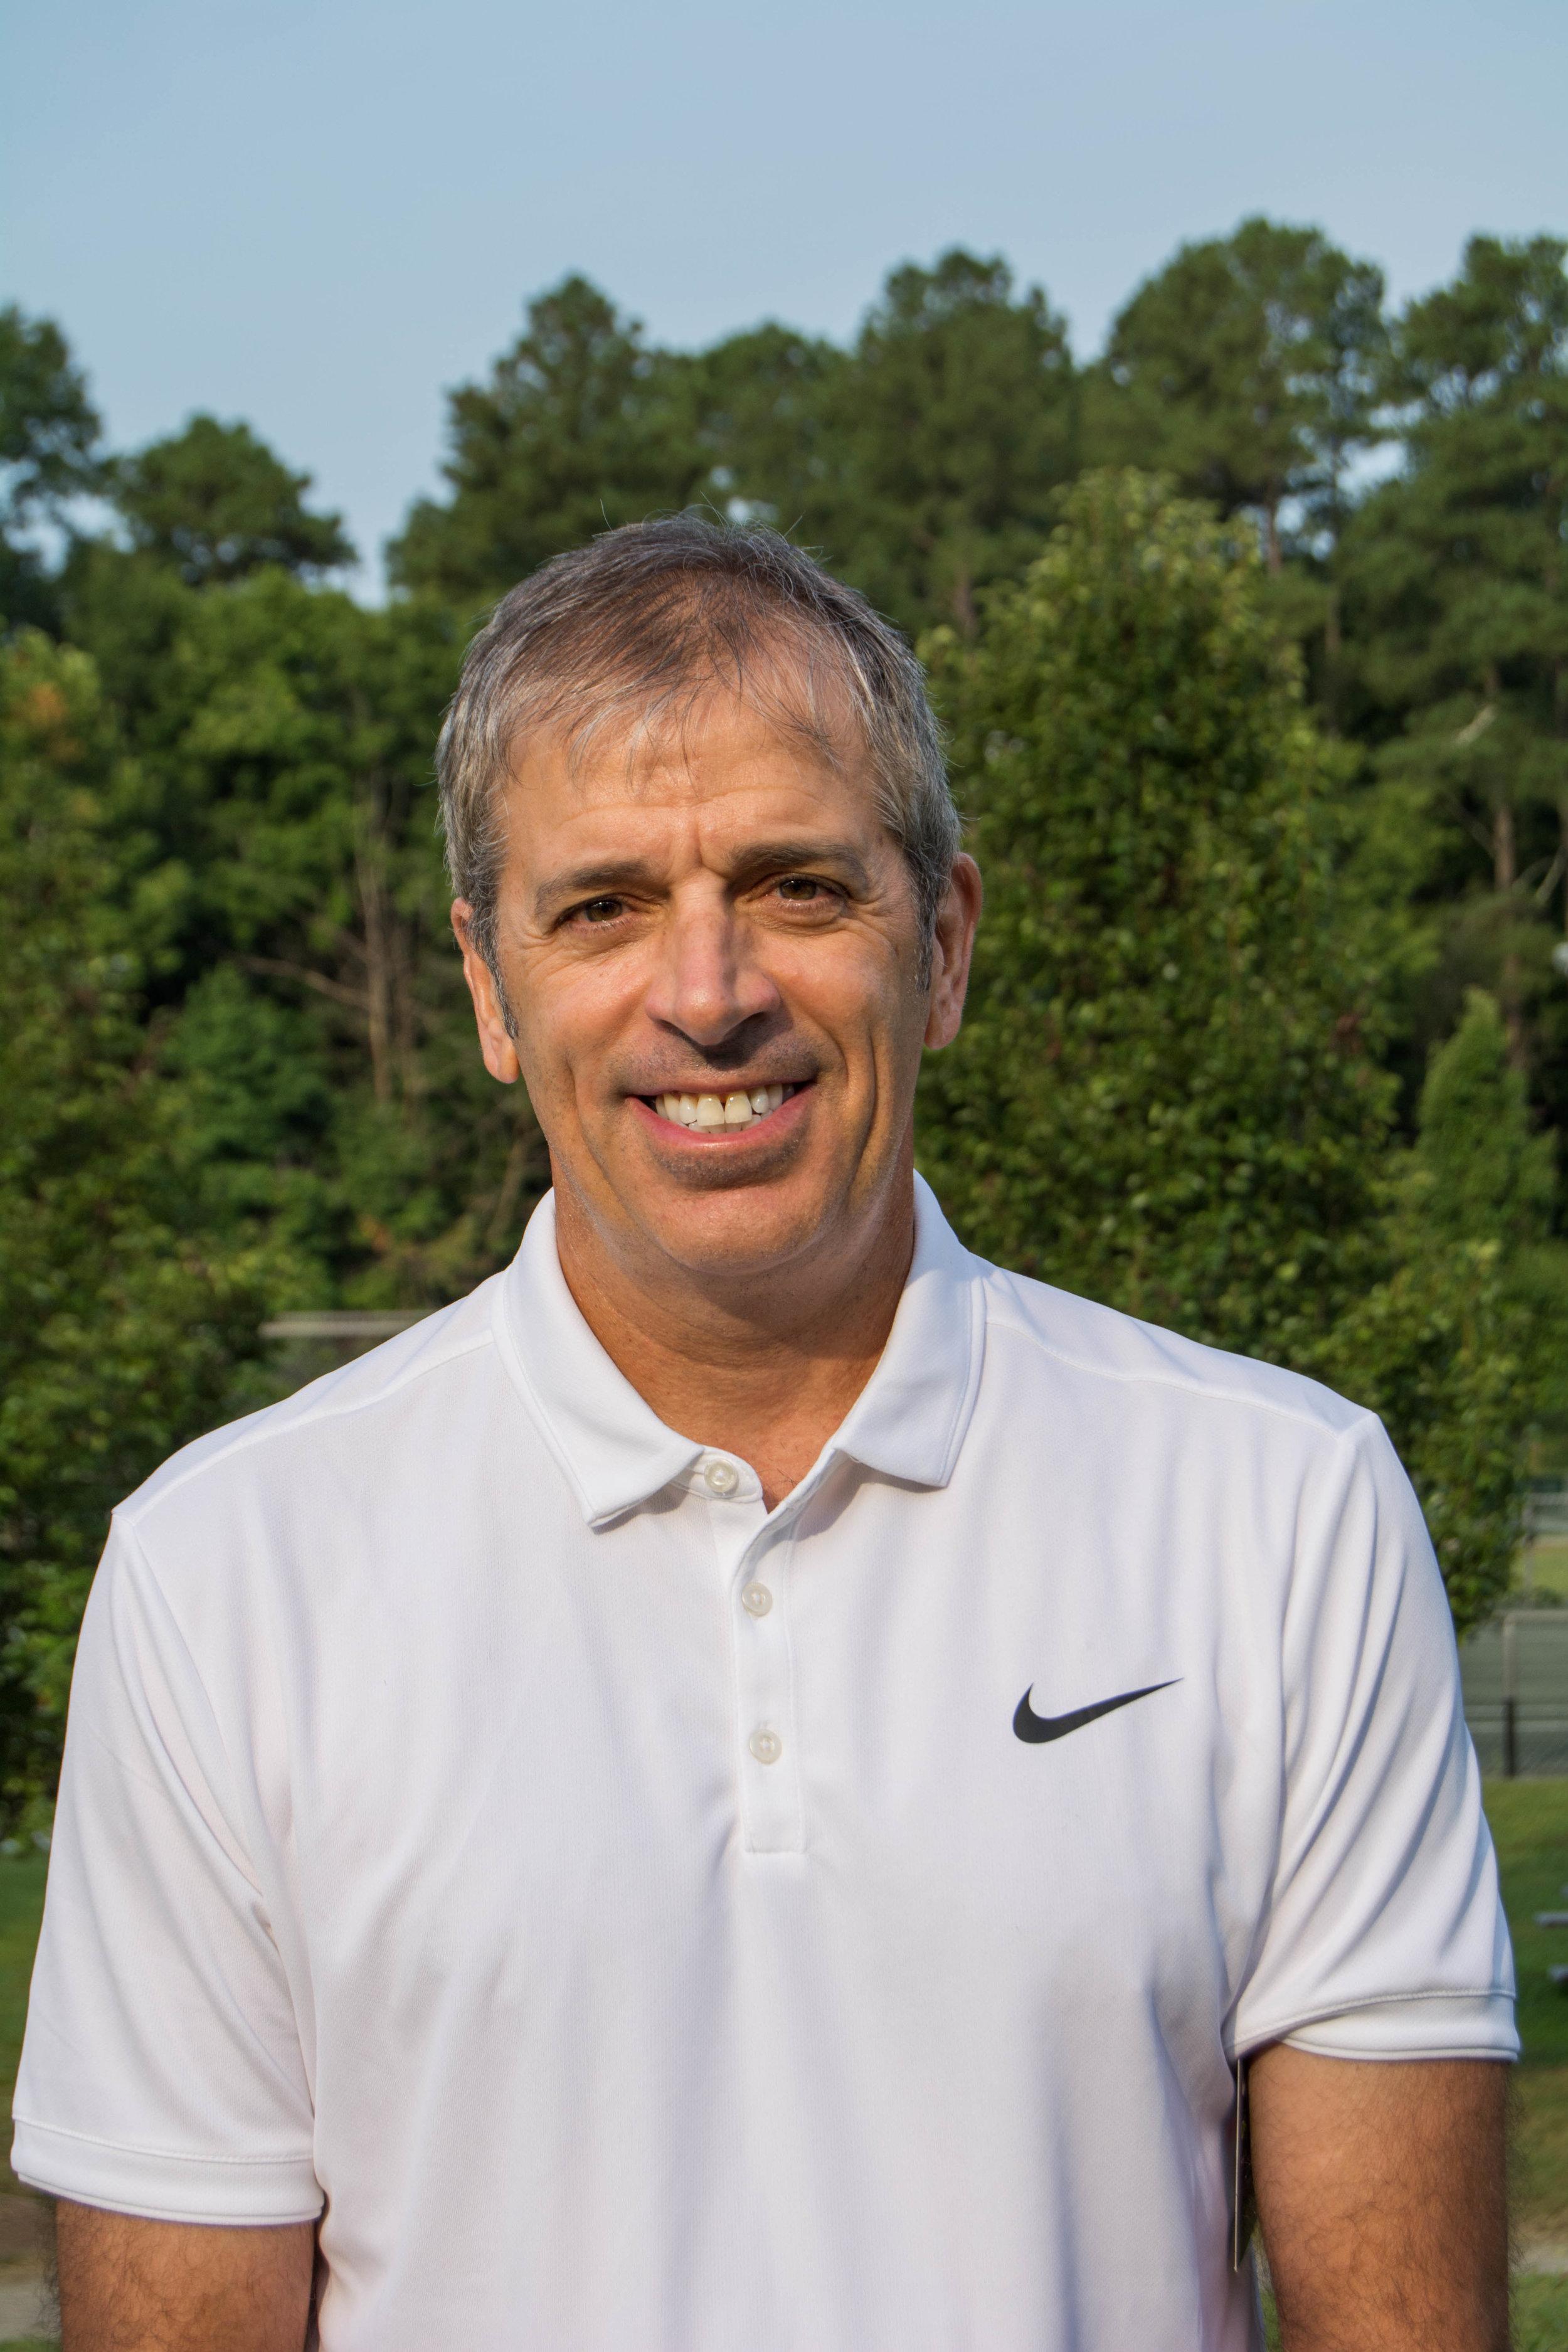 Larry Karageanes, Tennis Professional    Contact: lekarageanes@gmail.com